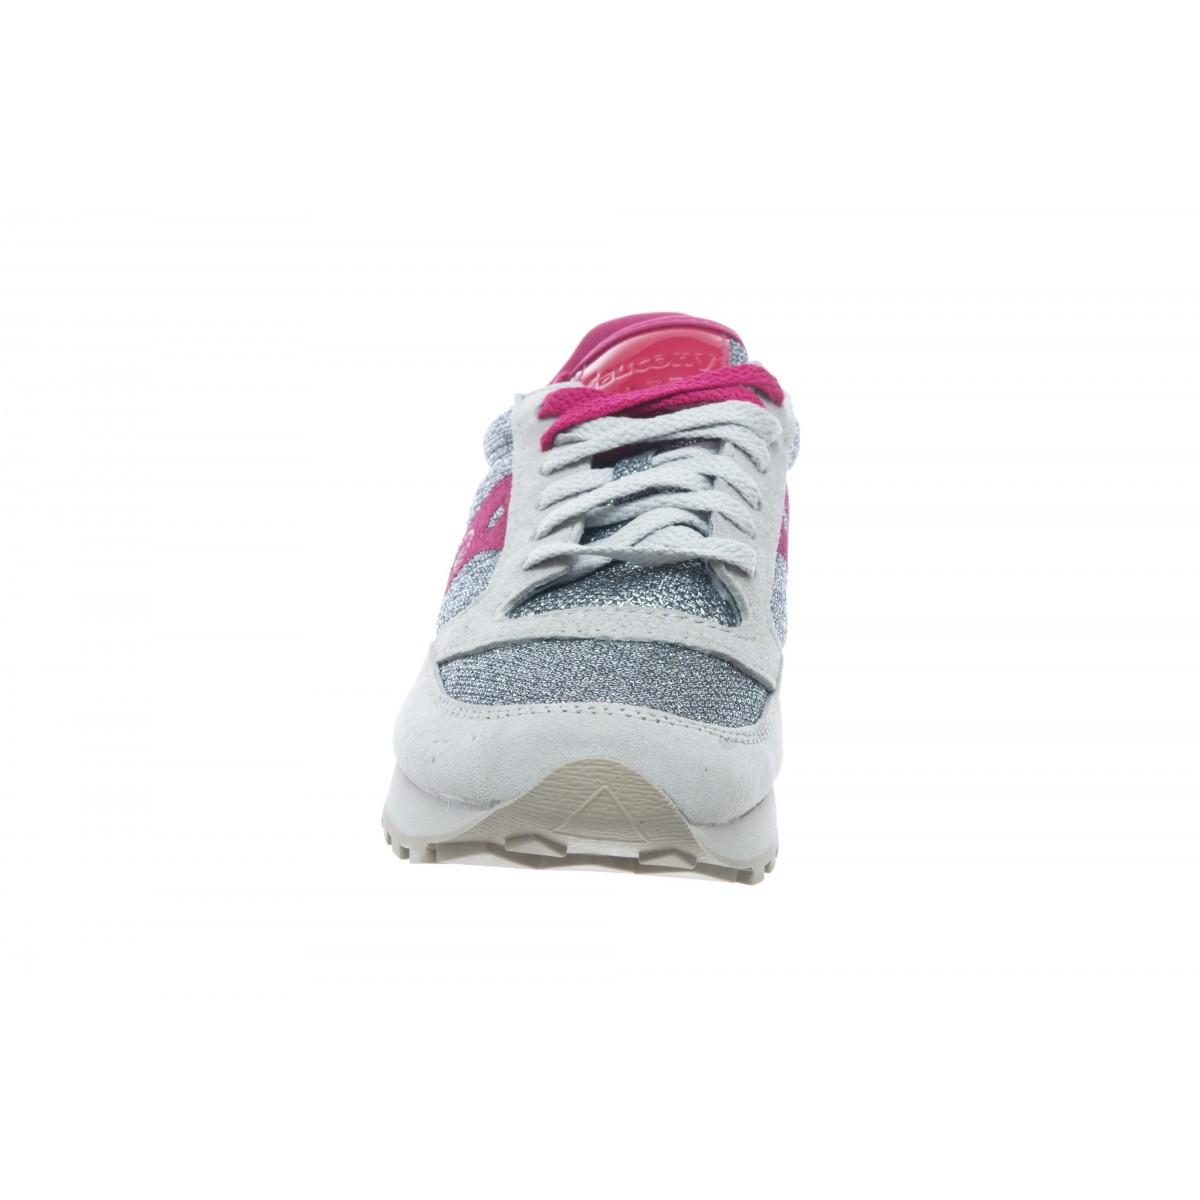 Scarpe - 60450 smo lurex glitter limited edition